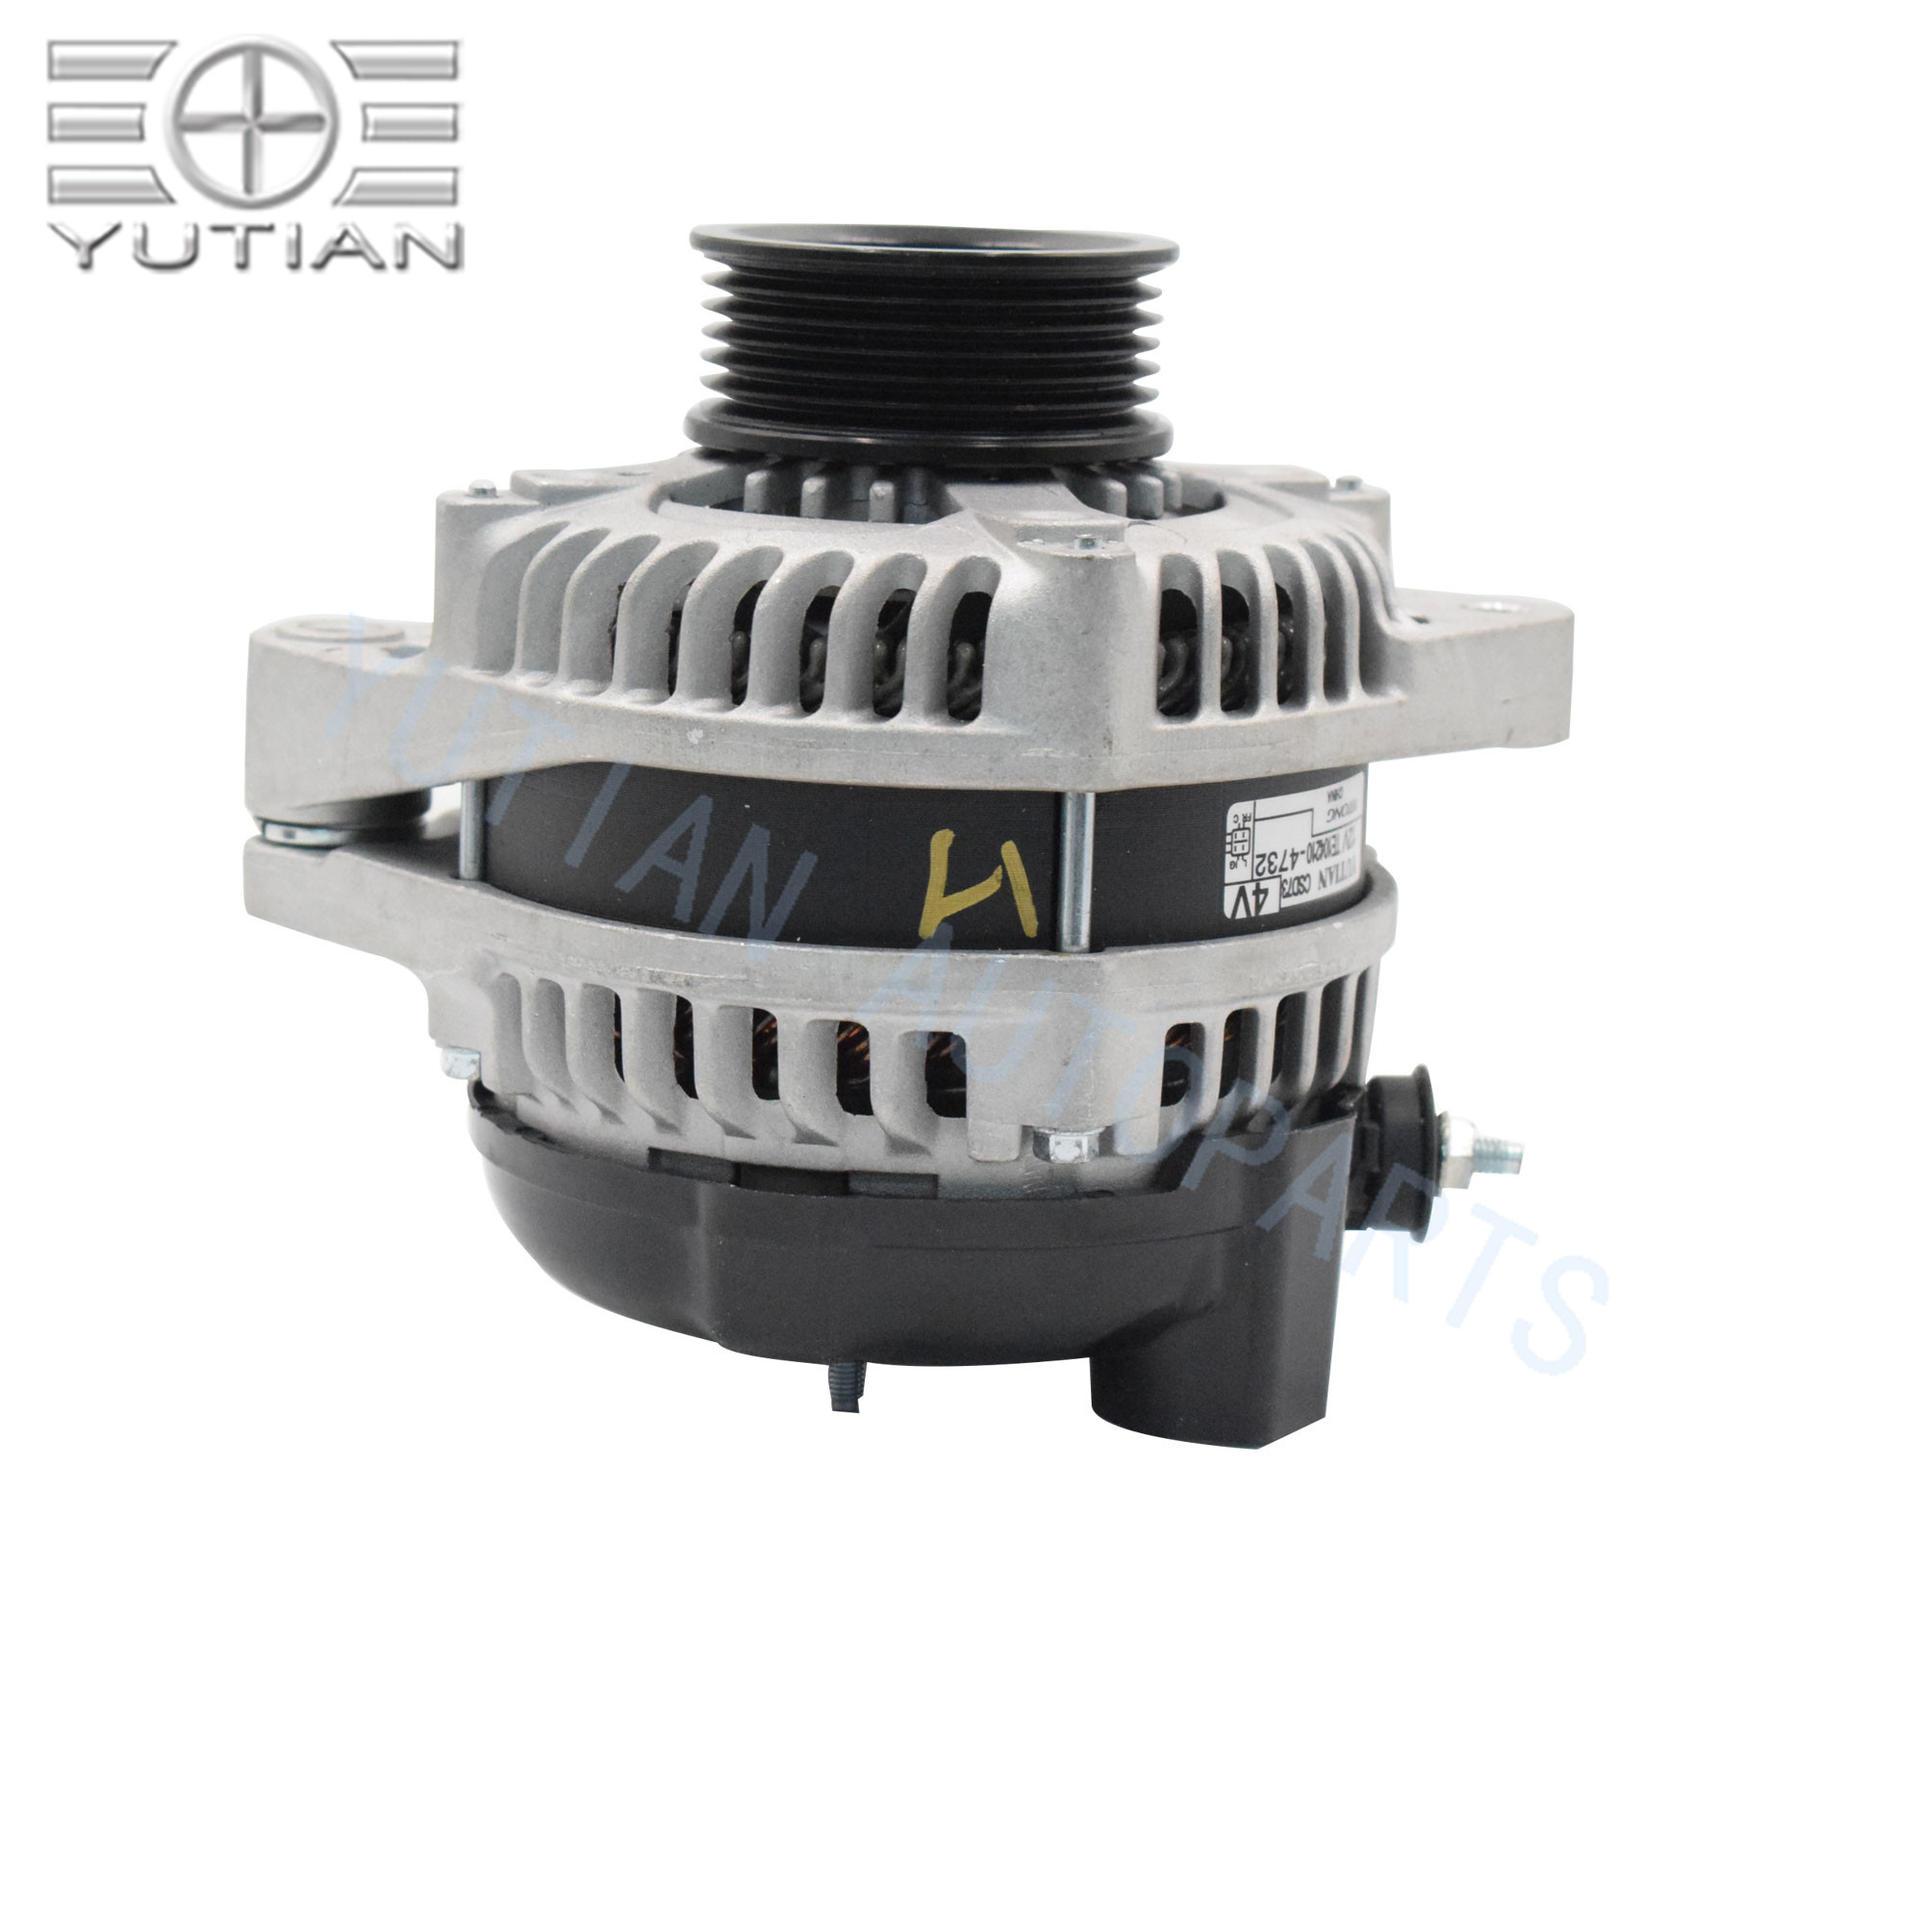 Alternator For Honda Accord 2003-2007 3.0L OEM 31100-RCA-A01